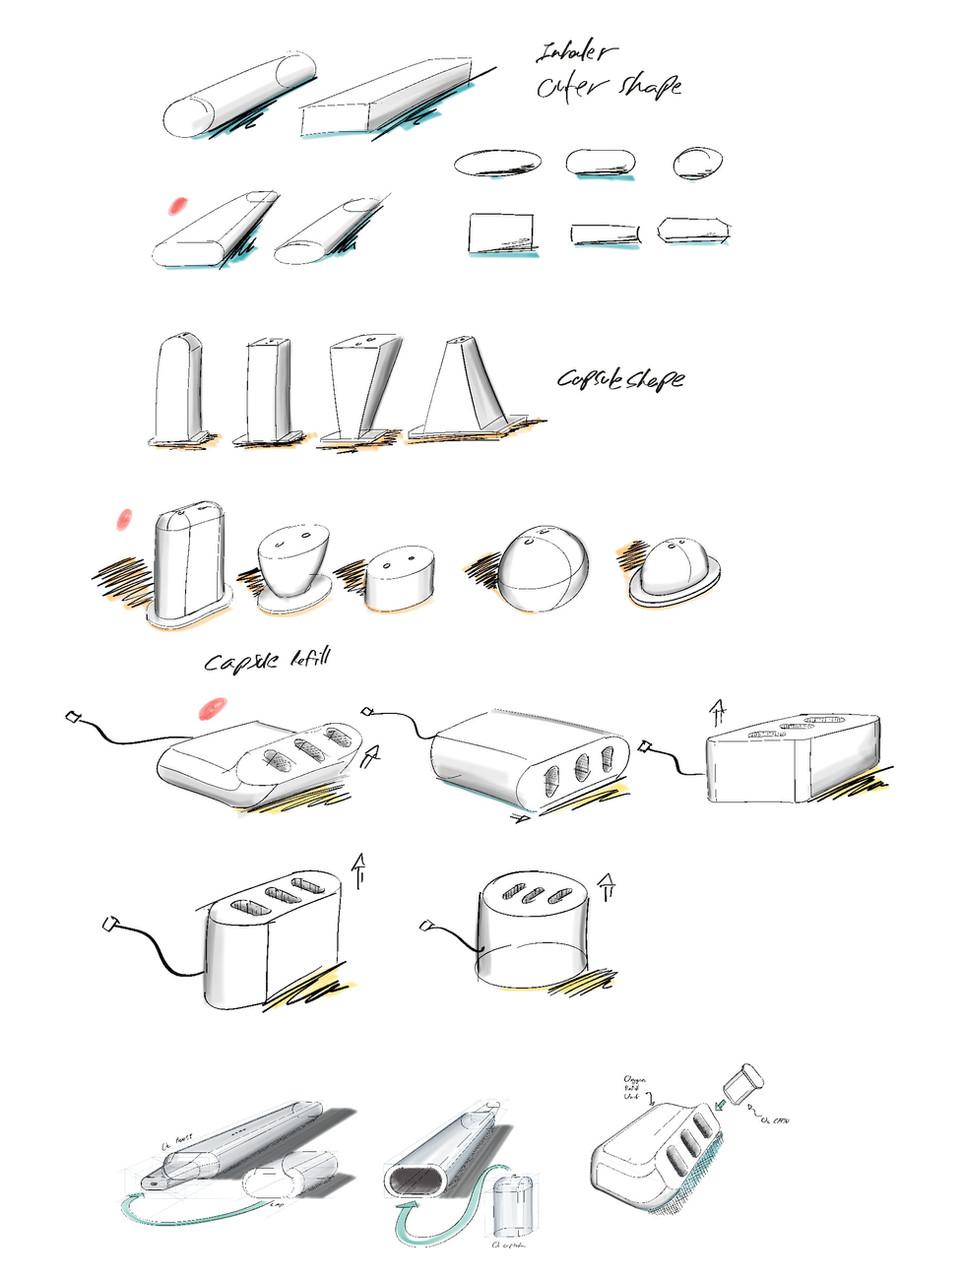 O2 sketches | AB Denizel